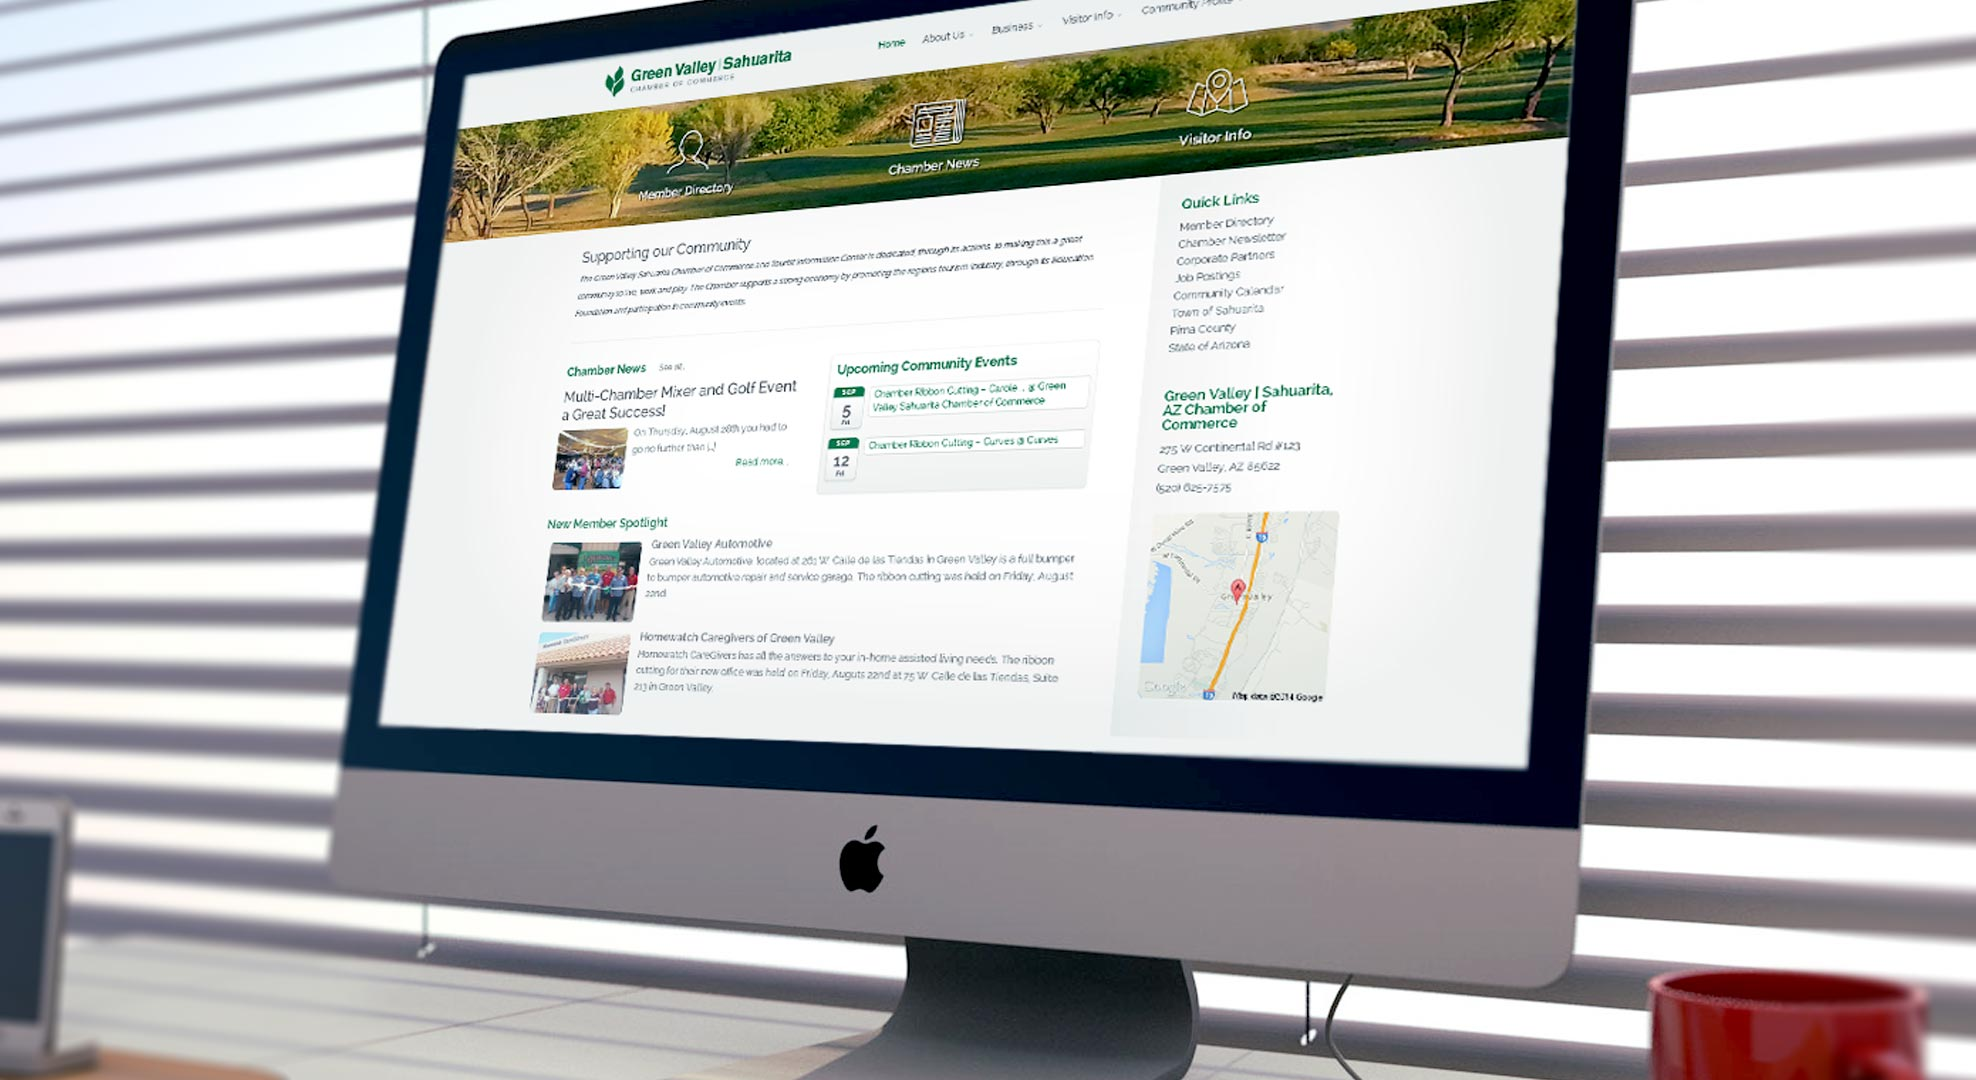 Green Valley Sahuarita Chamber of Commerce